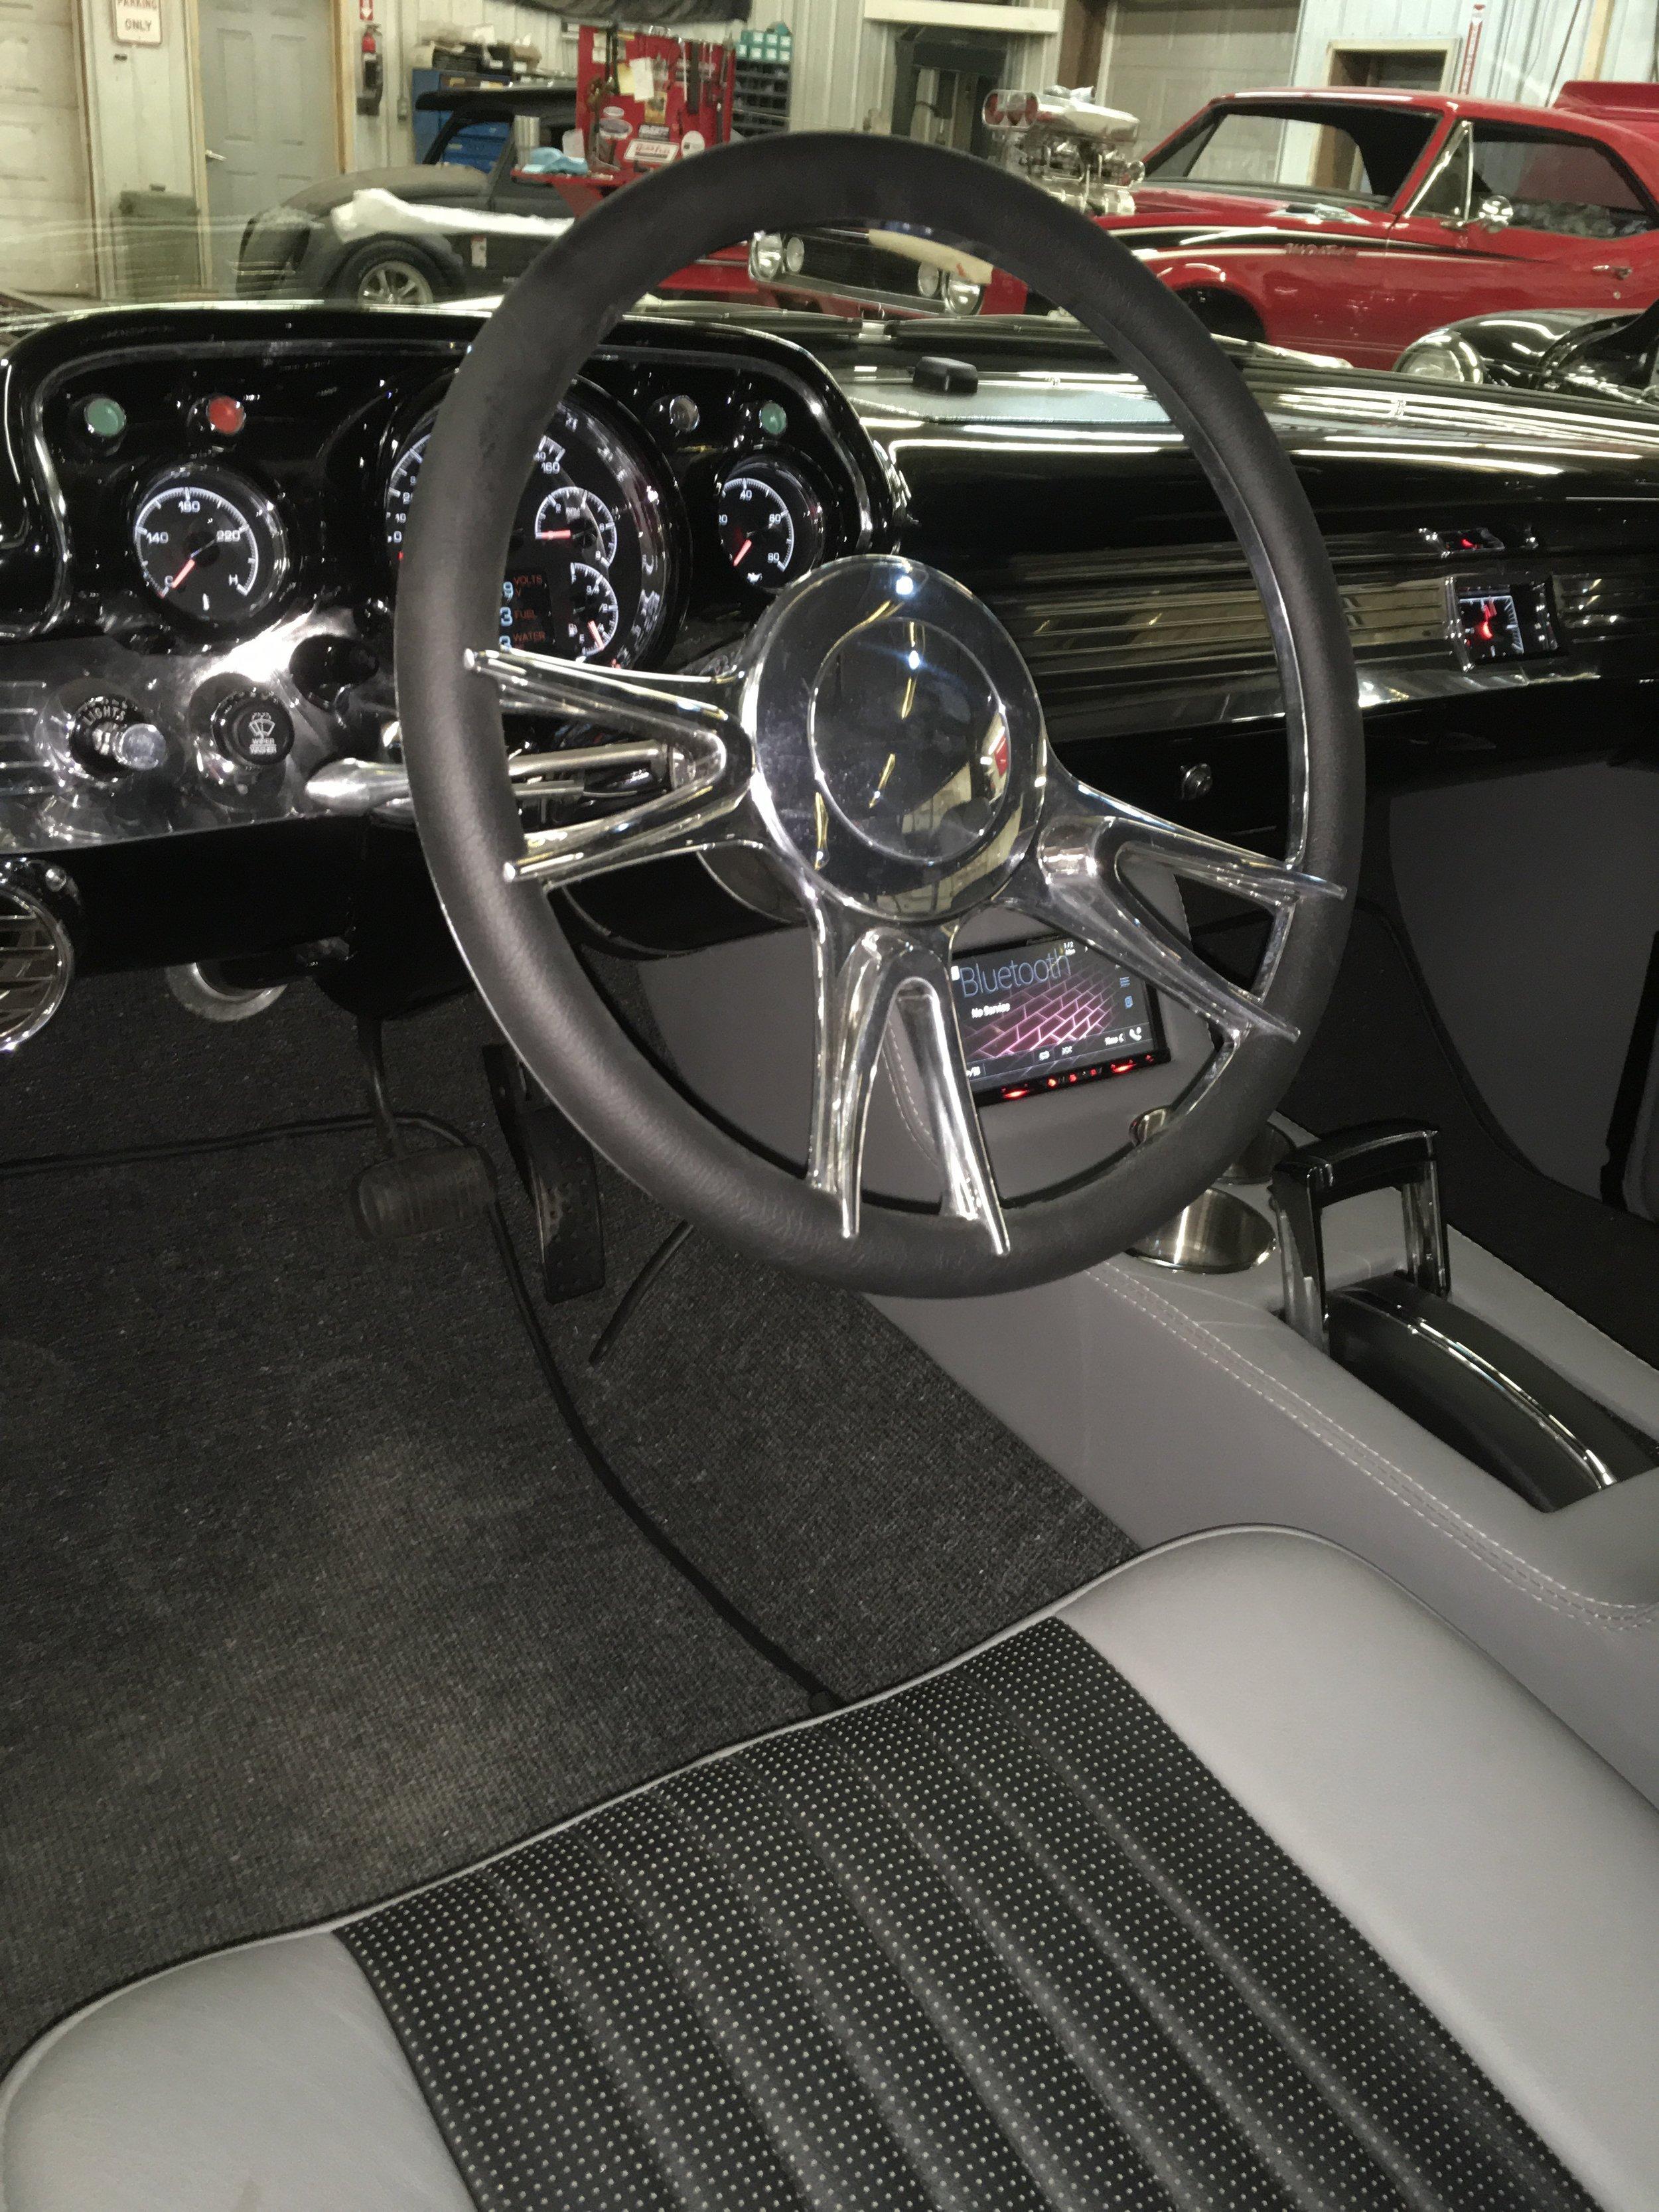 1957-Nomad-steering-wheel-minneapolis-hot-rod-restoration-hot-rod-factory.jpg